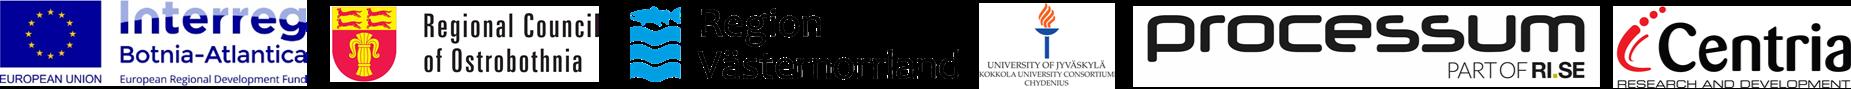 Logokuva.png